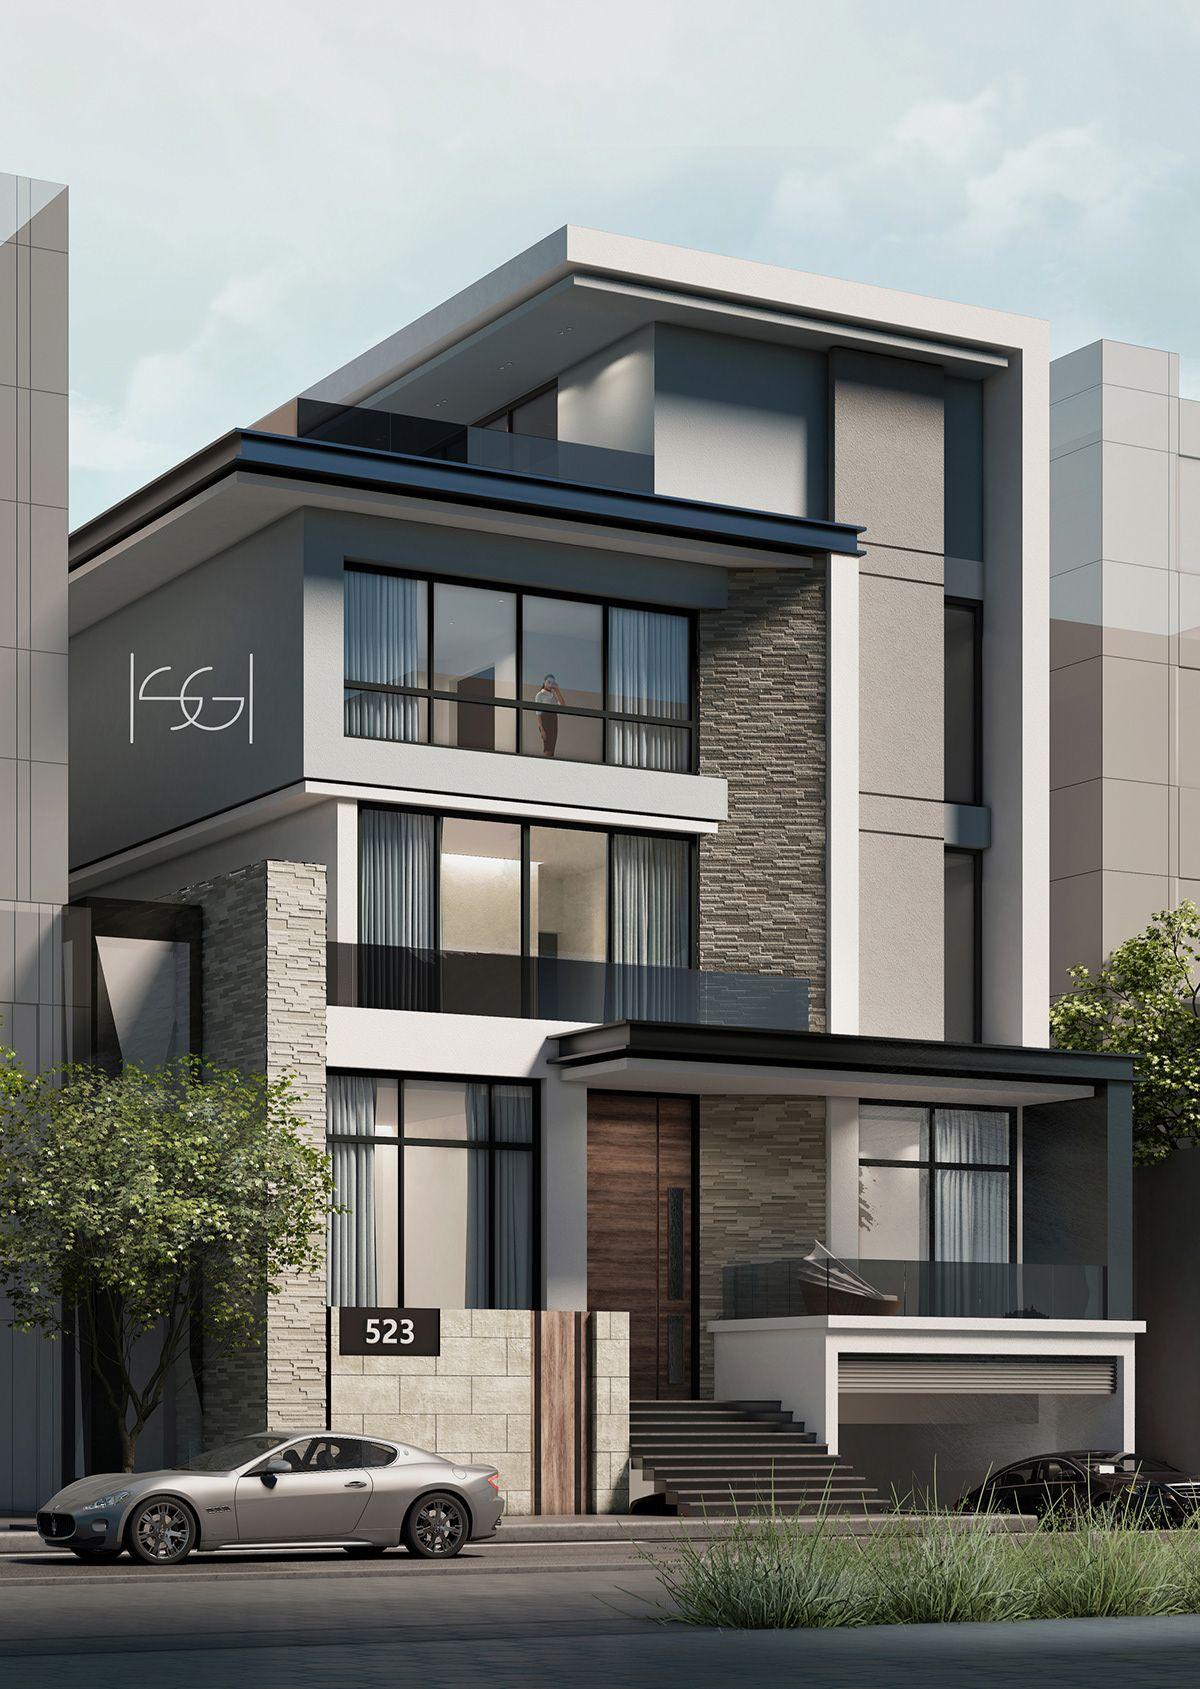 Residential Villa Kuwait On Behance 3 Storey House Design House Architecture Styles House Architecture Design